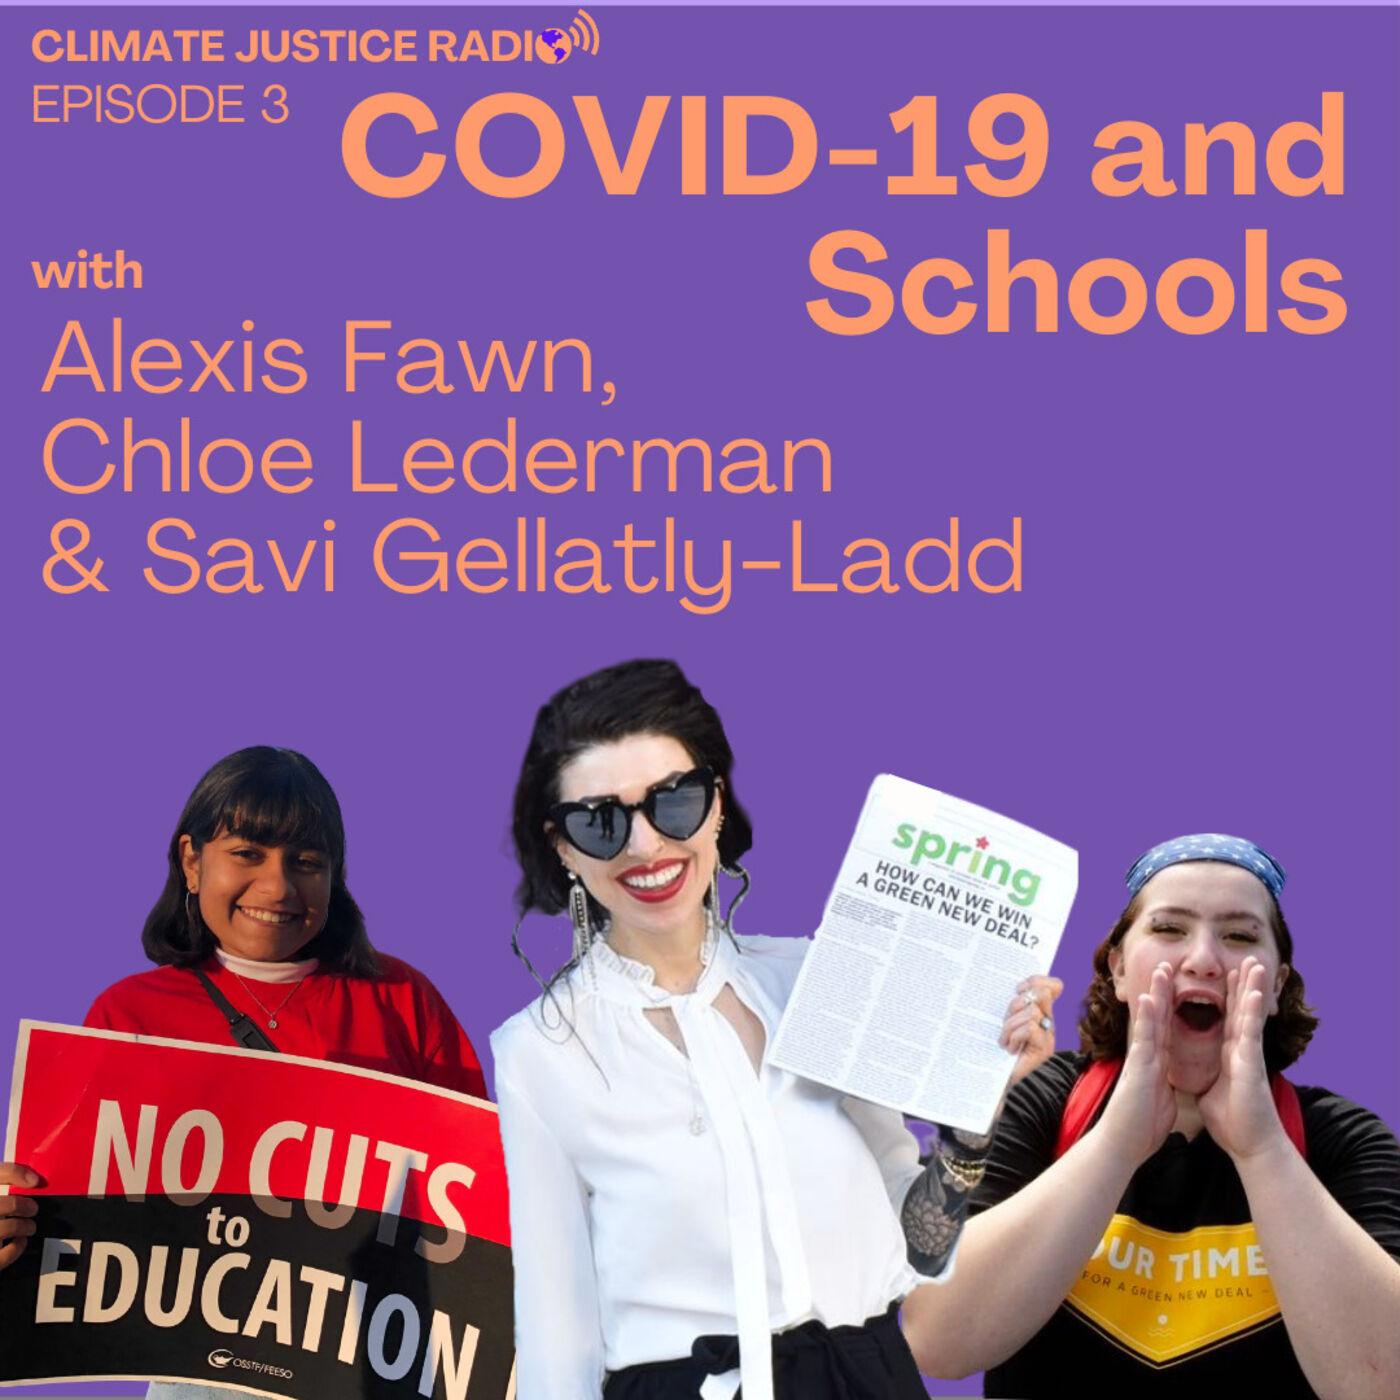 Episode 3 - COVID-19 and Schools